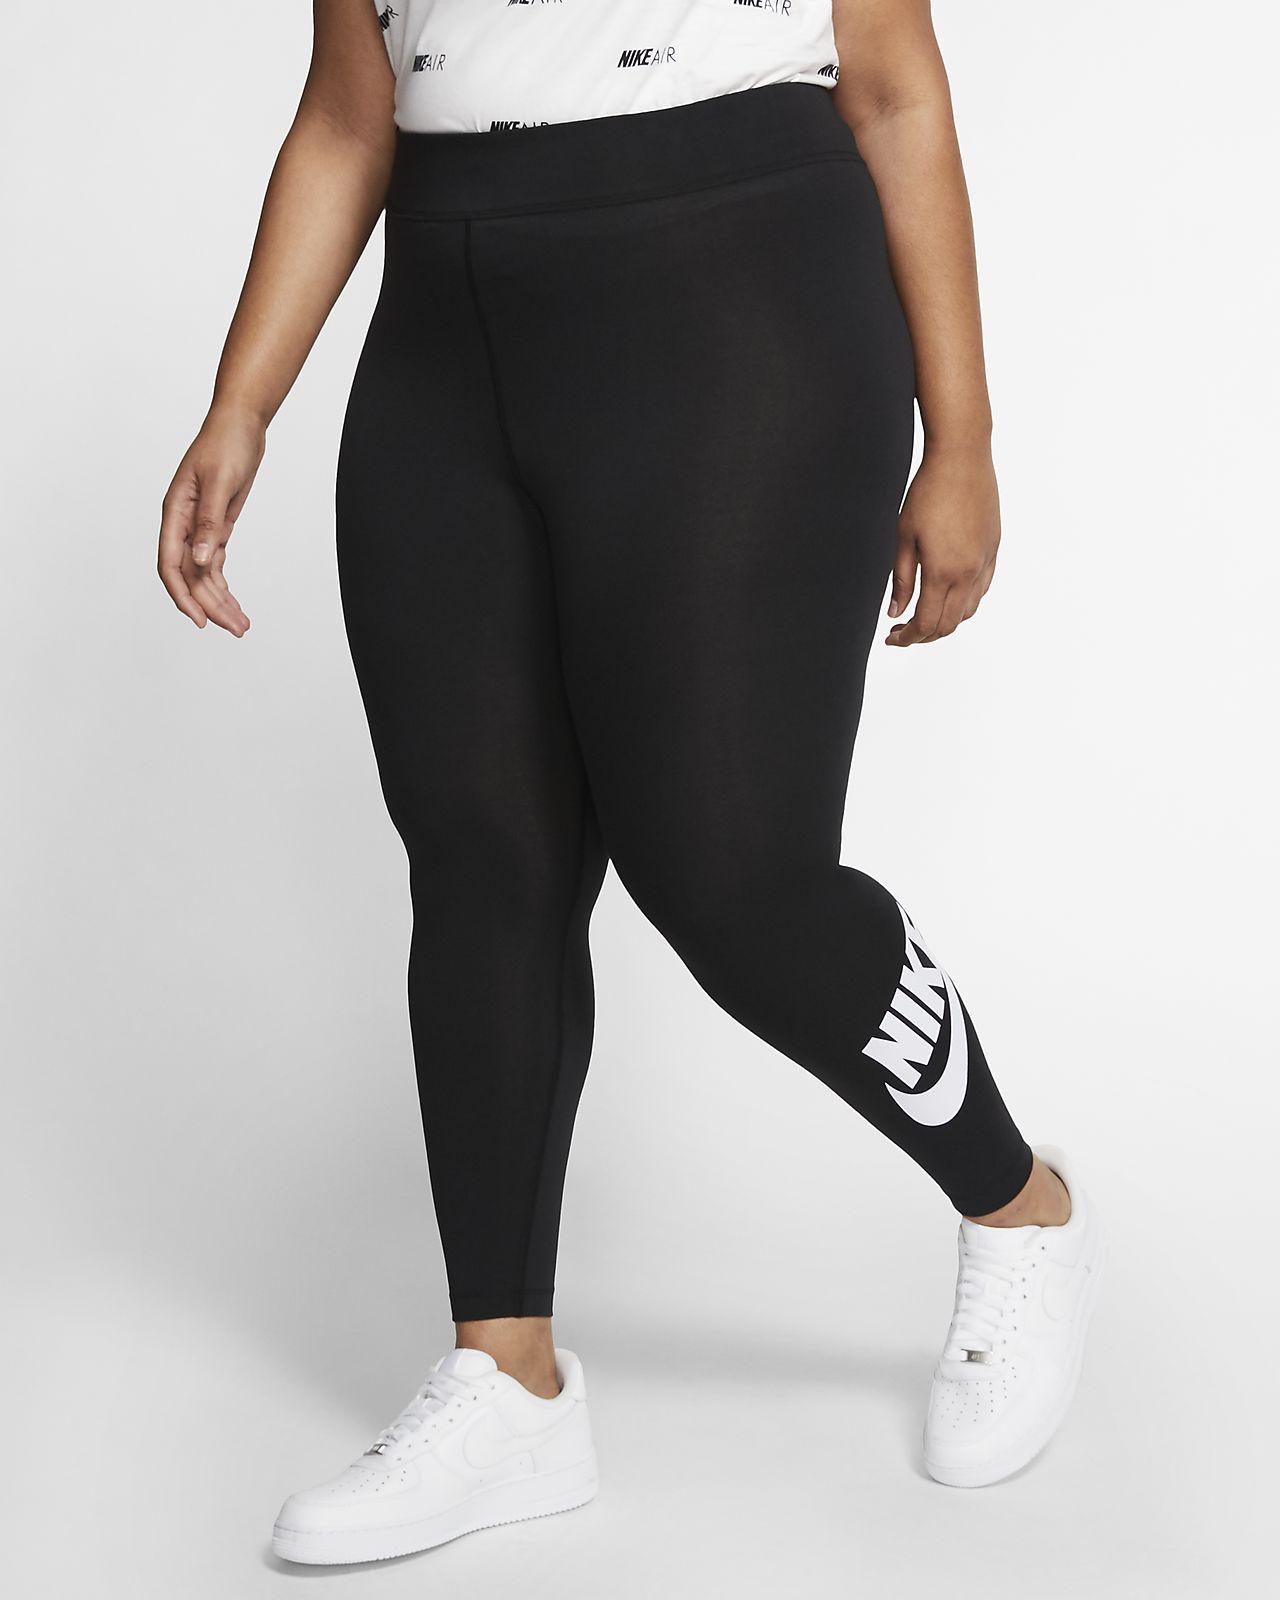 Leggings de cintura subida Nike Sportswear Leg-A-See para mulher (tamanhos grandes)